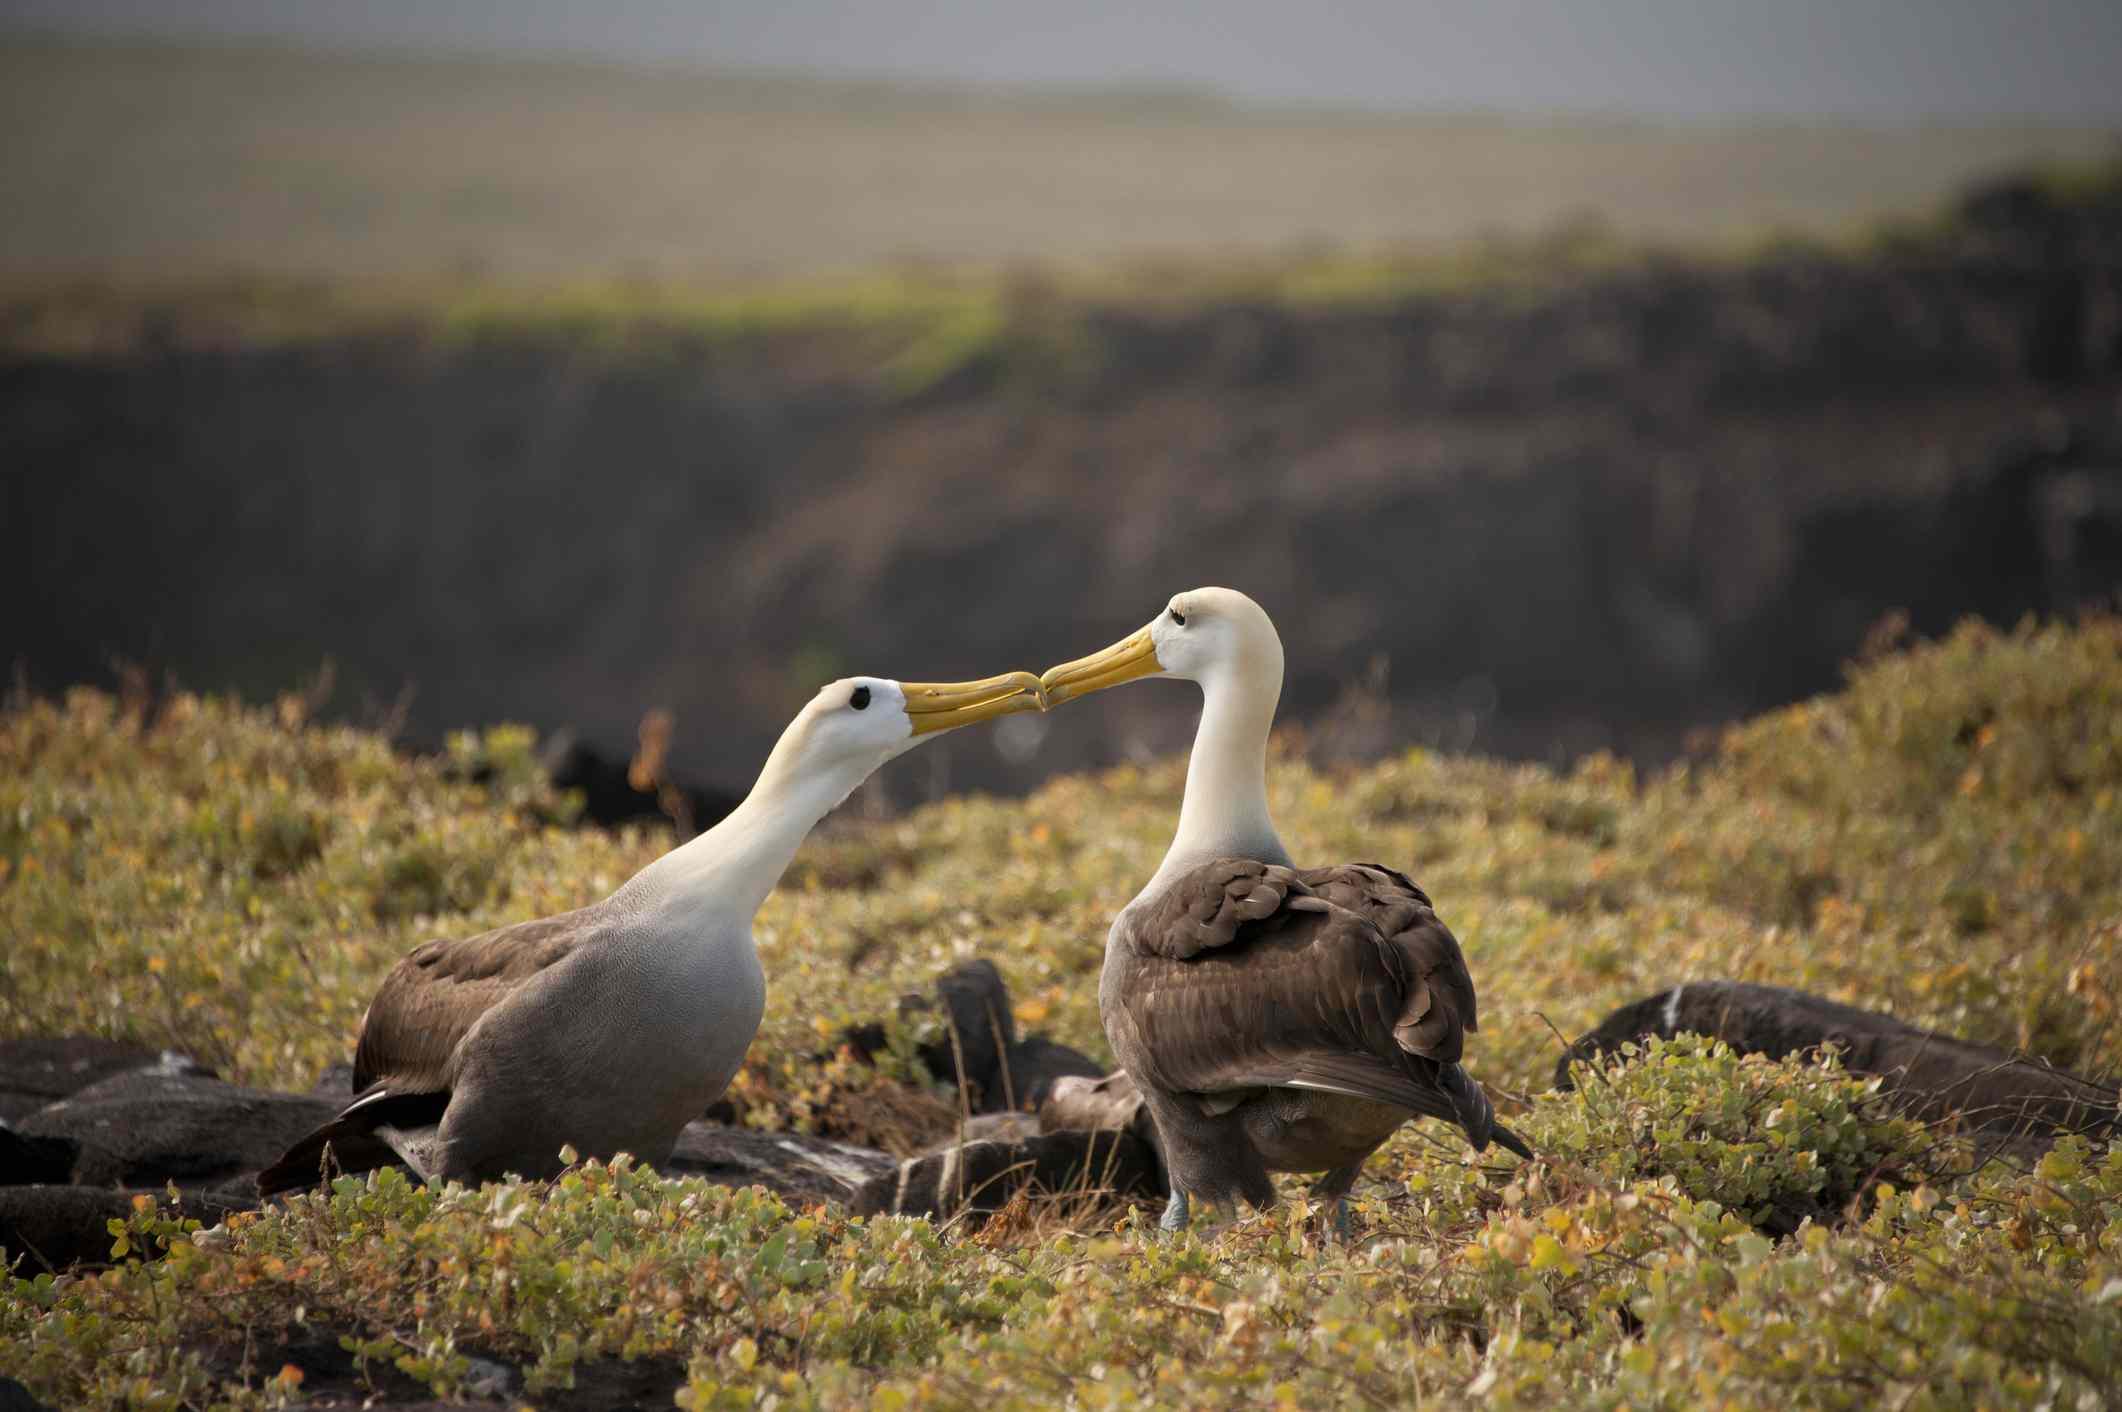 Albatross Birds courting dance, Galapagos Islands, Ecuador